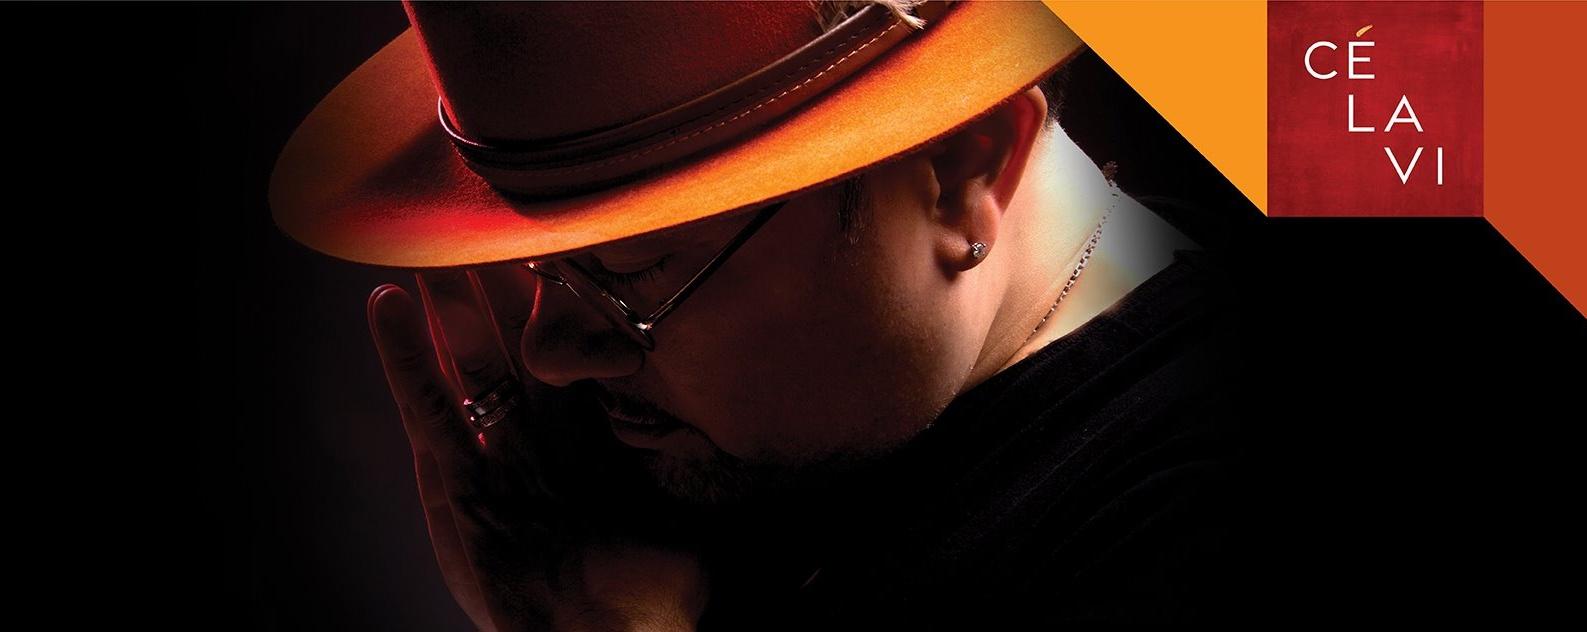 CÉ LA VI Presents Grammy Award-Winning DJ And Producer Louie Vega